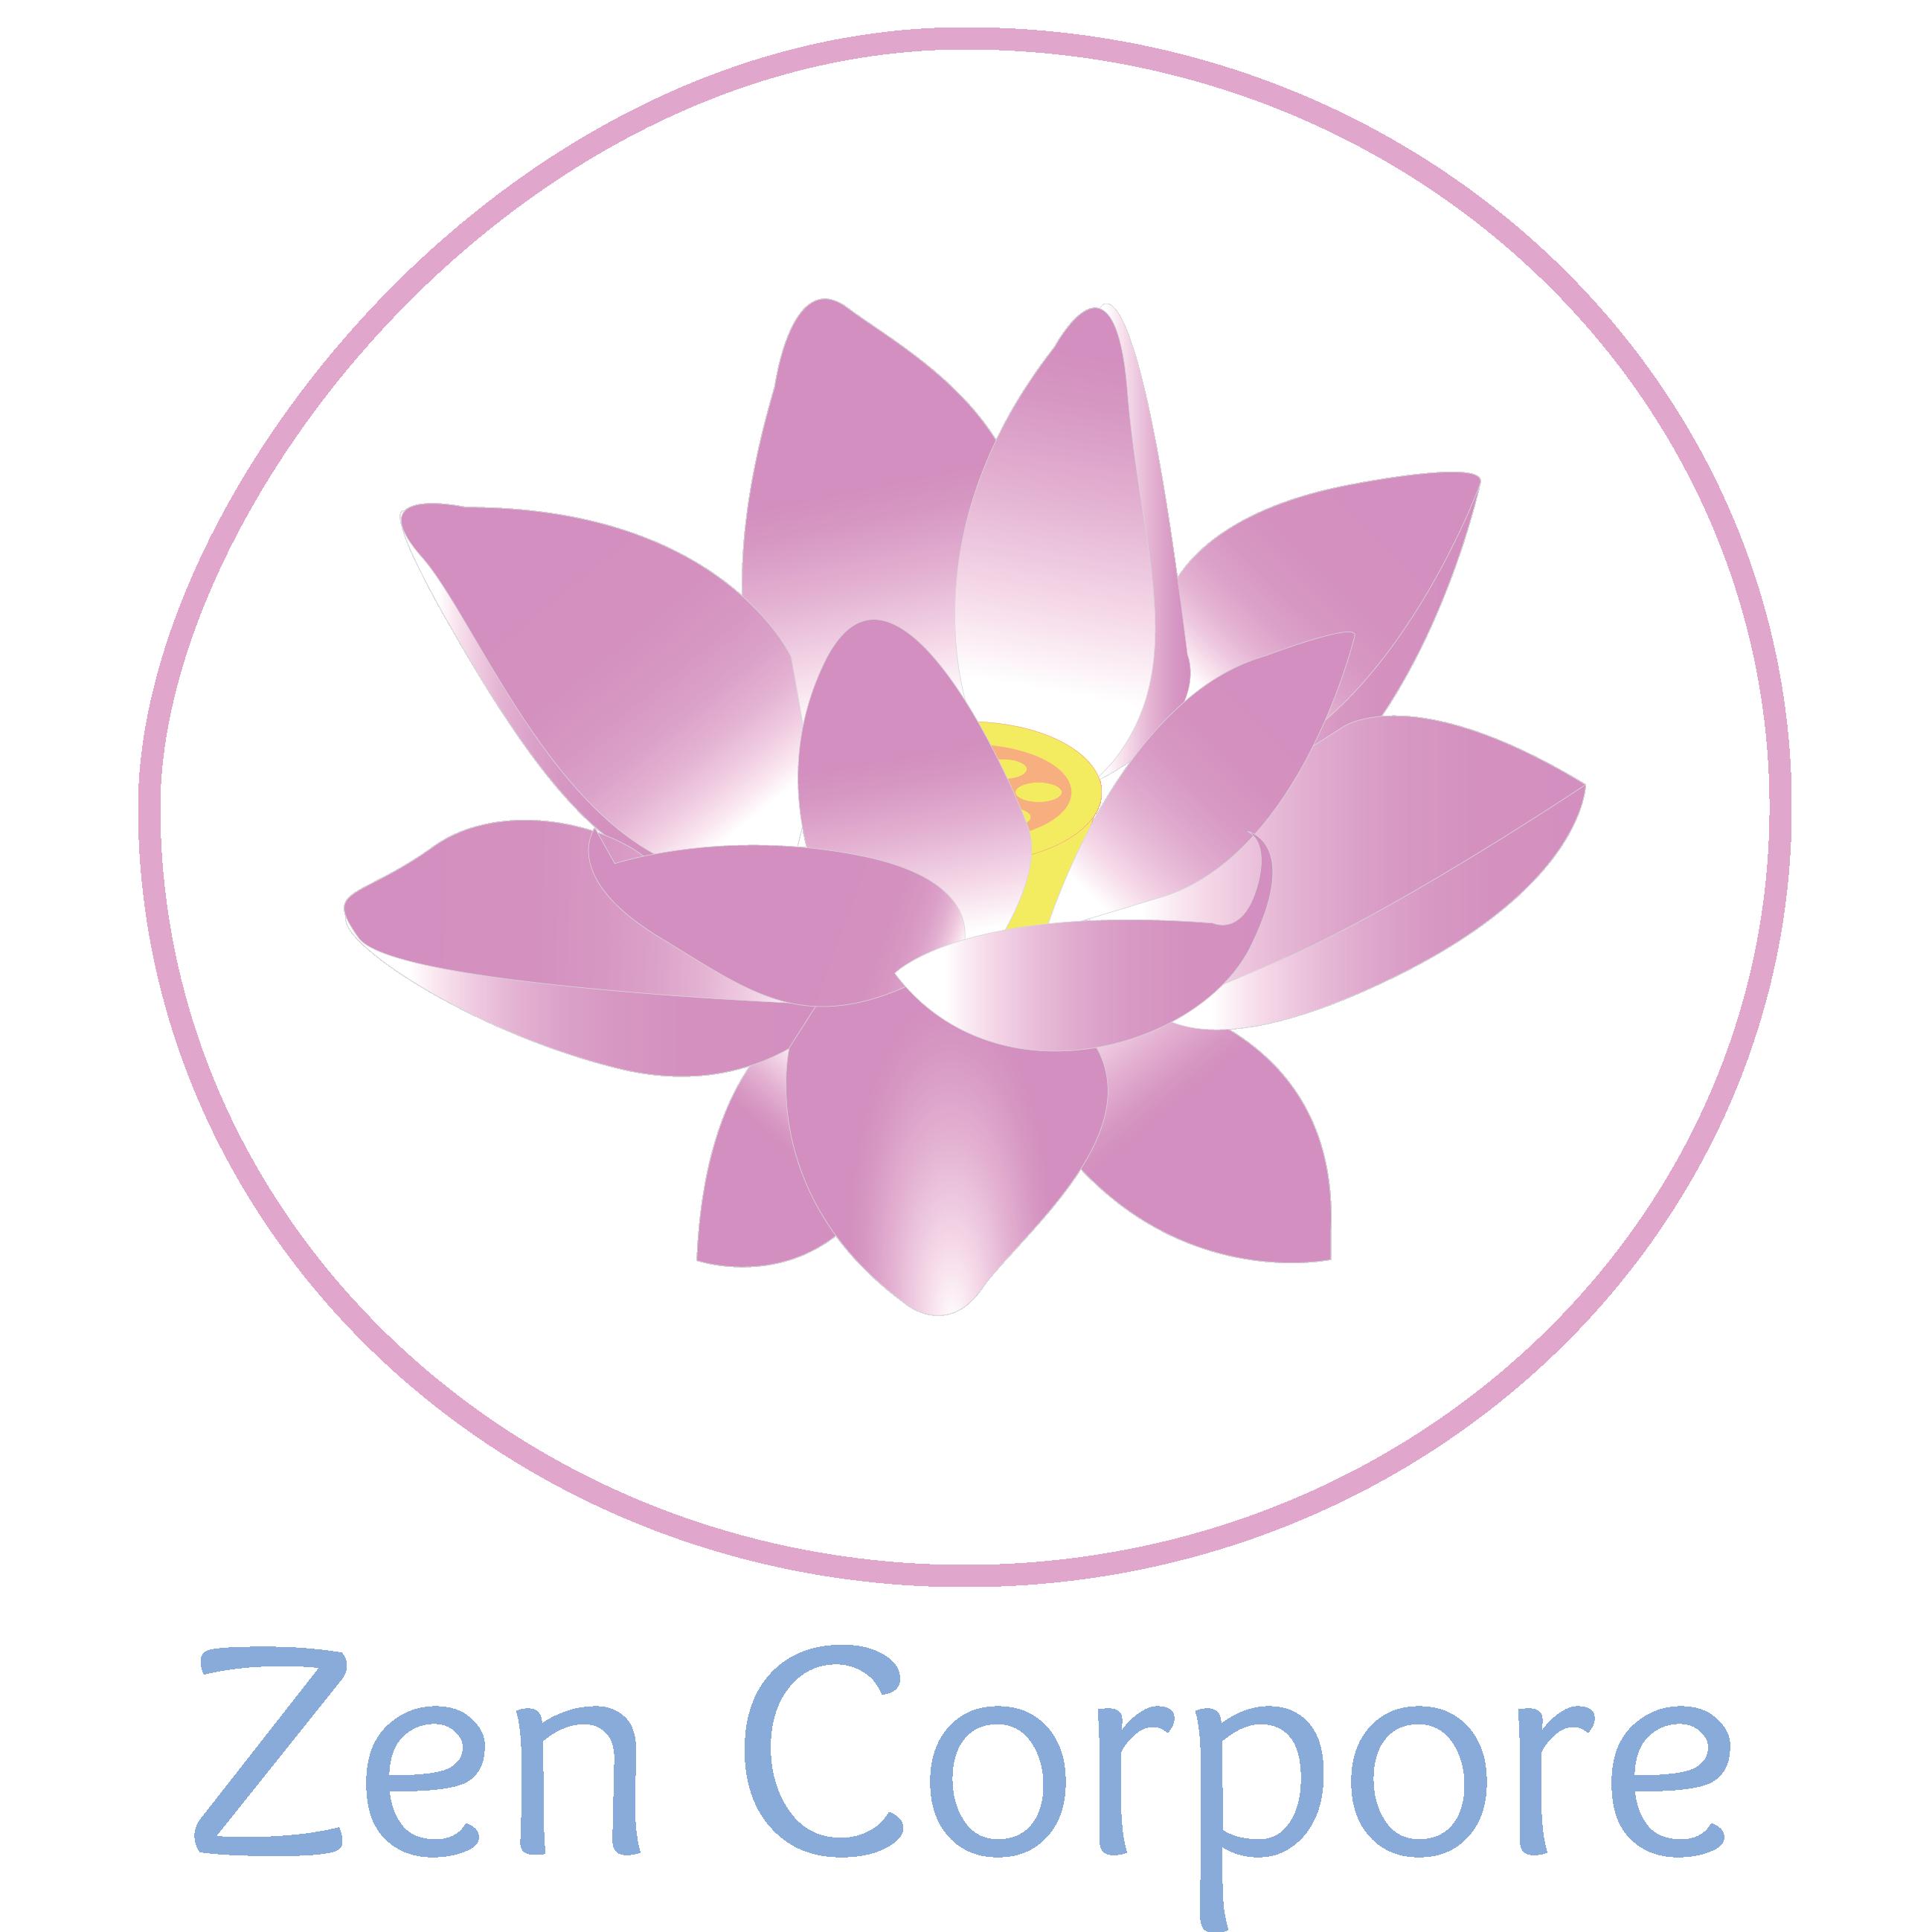 Zen Corpore